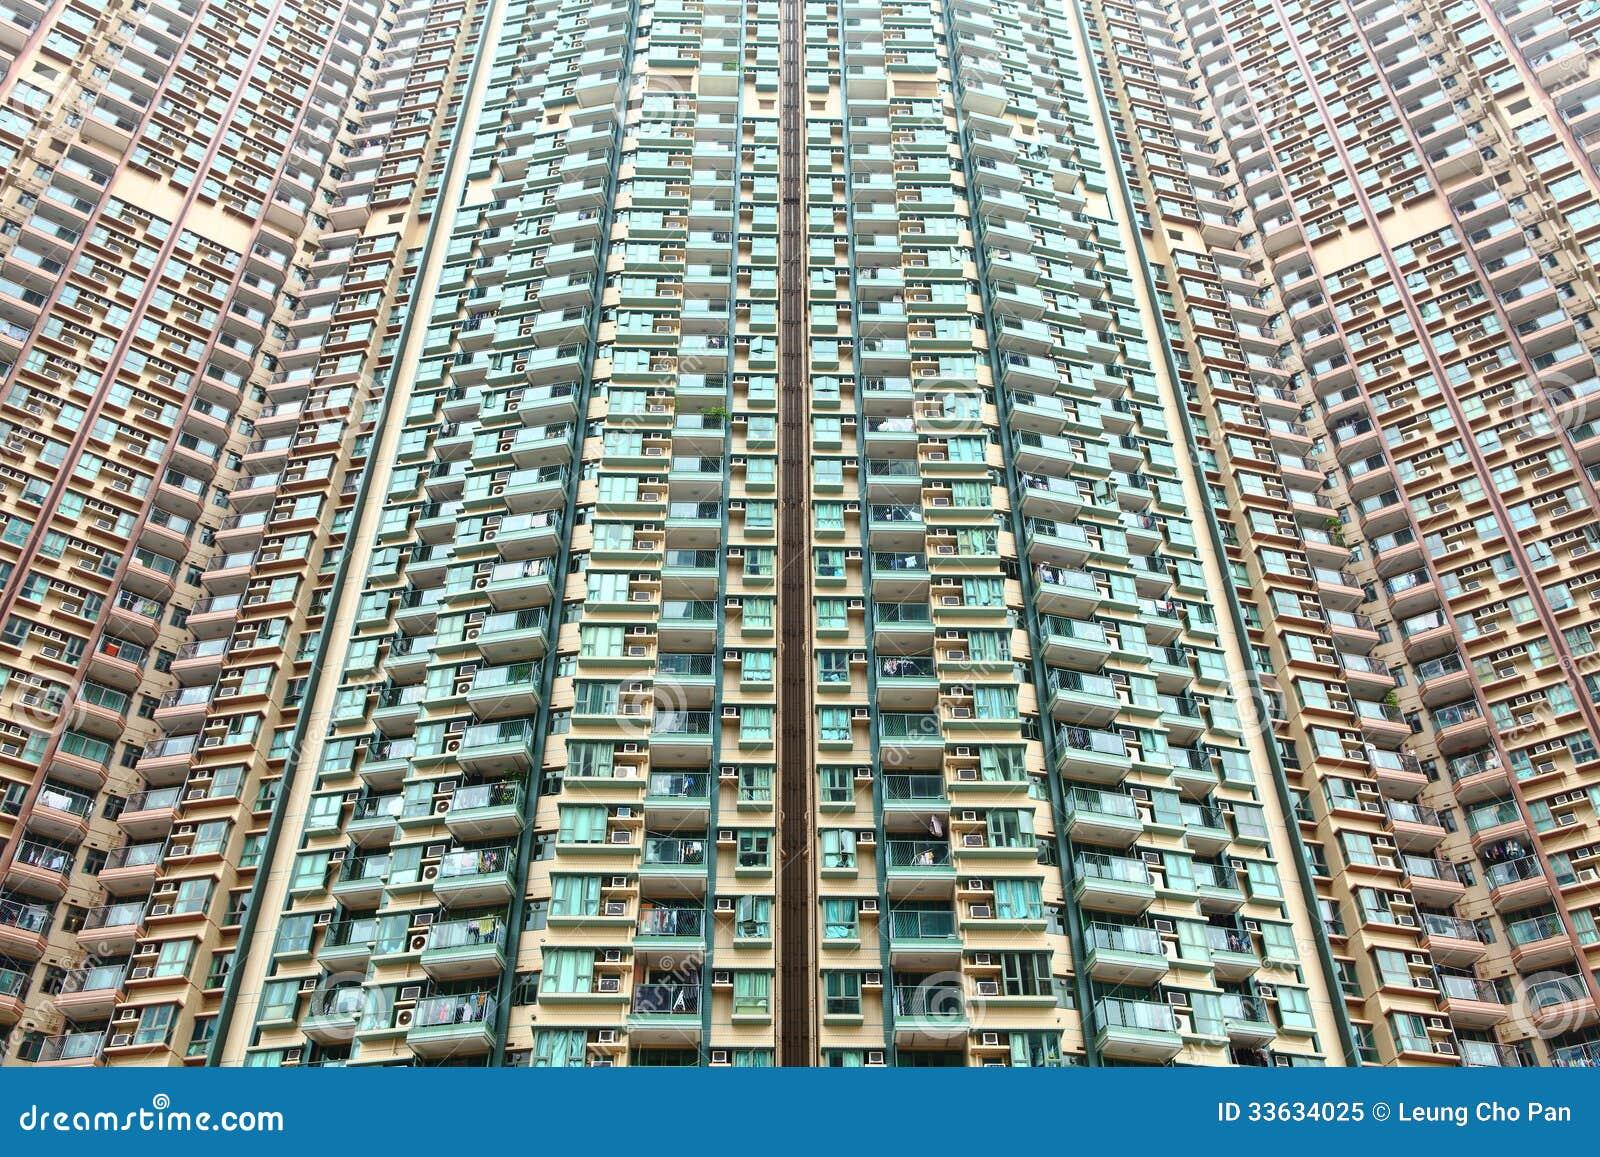 hong kong residential buildings royalty free stock photo